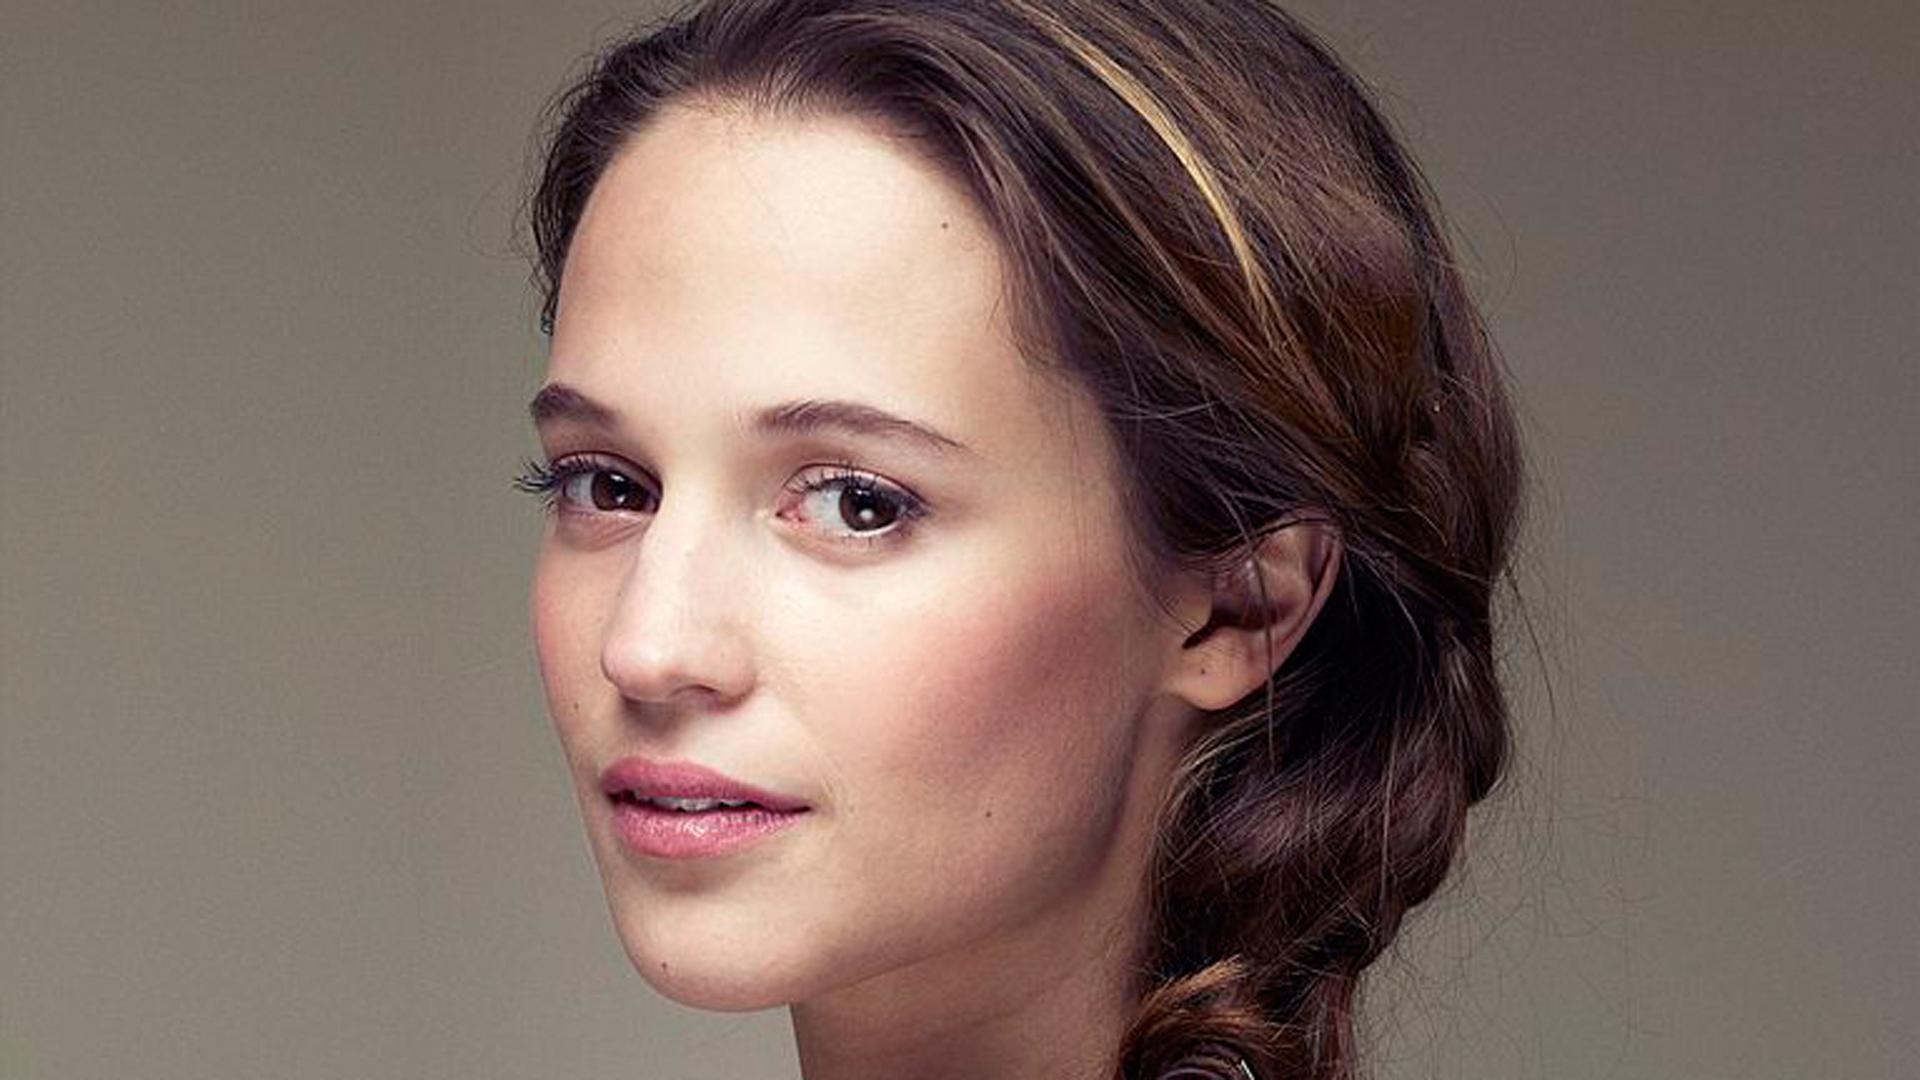 Alicia Vikander Cast As Lara Croft In Tomb Raider Movie Reboot